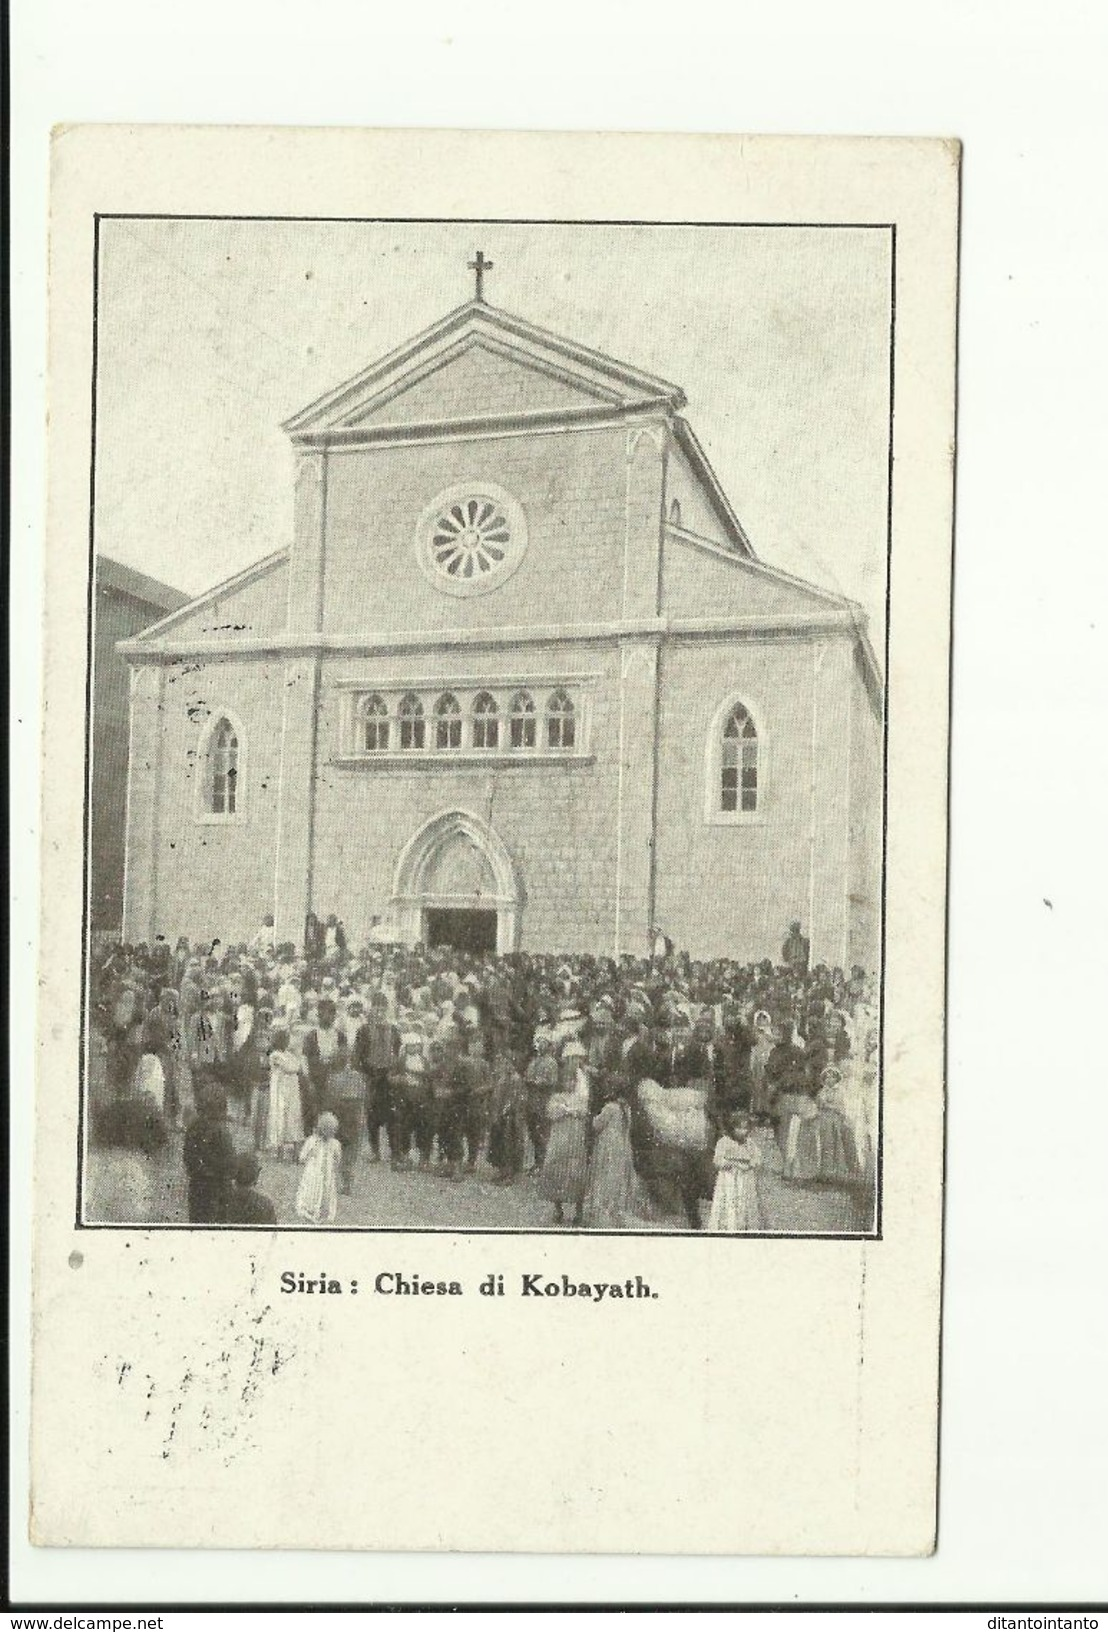 1924 SIRIA . CHIESA DI KOBAYATH. SYRIA KOBAYAT QOUBAIYAT ? CHURCH. LIBANO LEBANON? - Siria